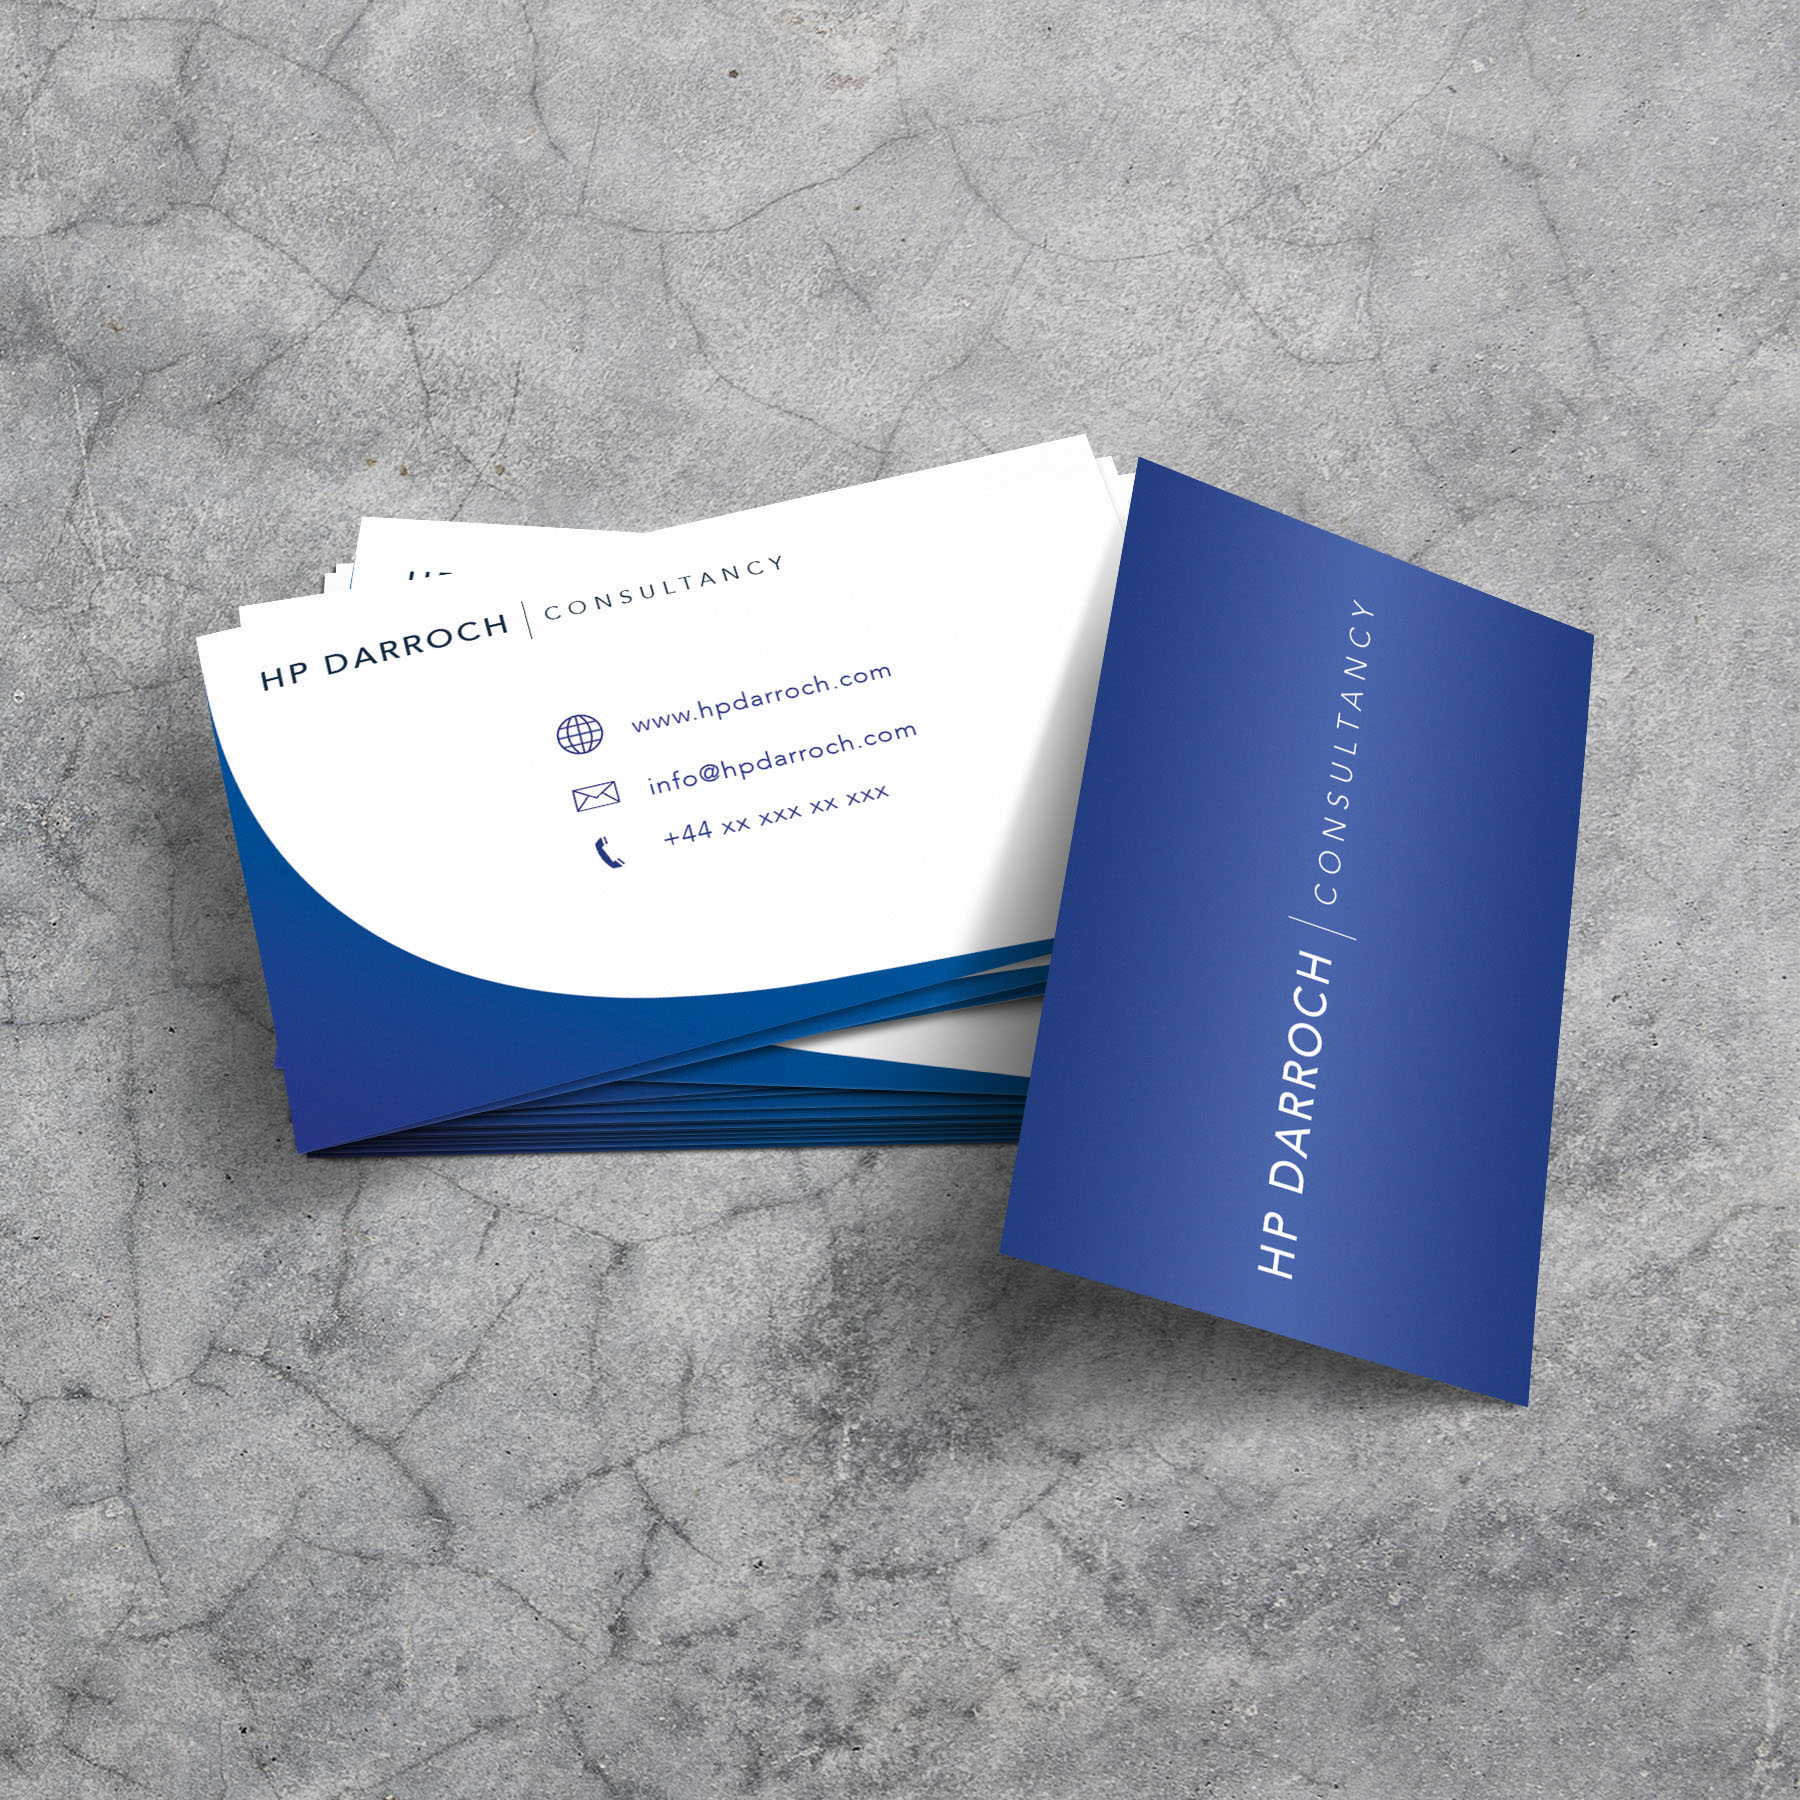 Agnes Lewandowska - HP Darroch Business Cards